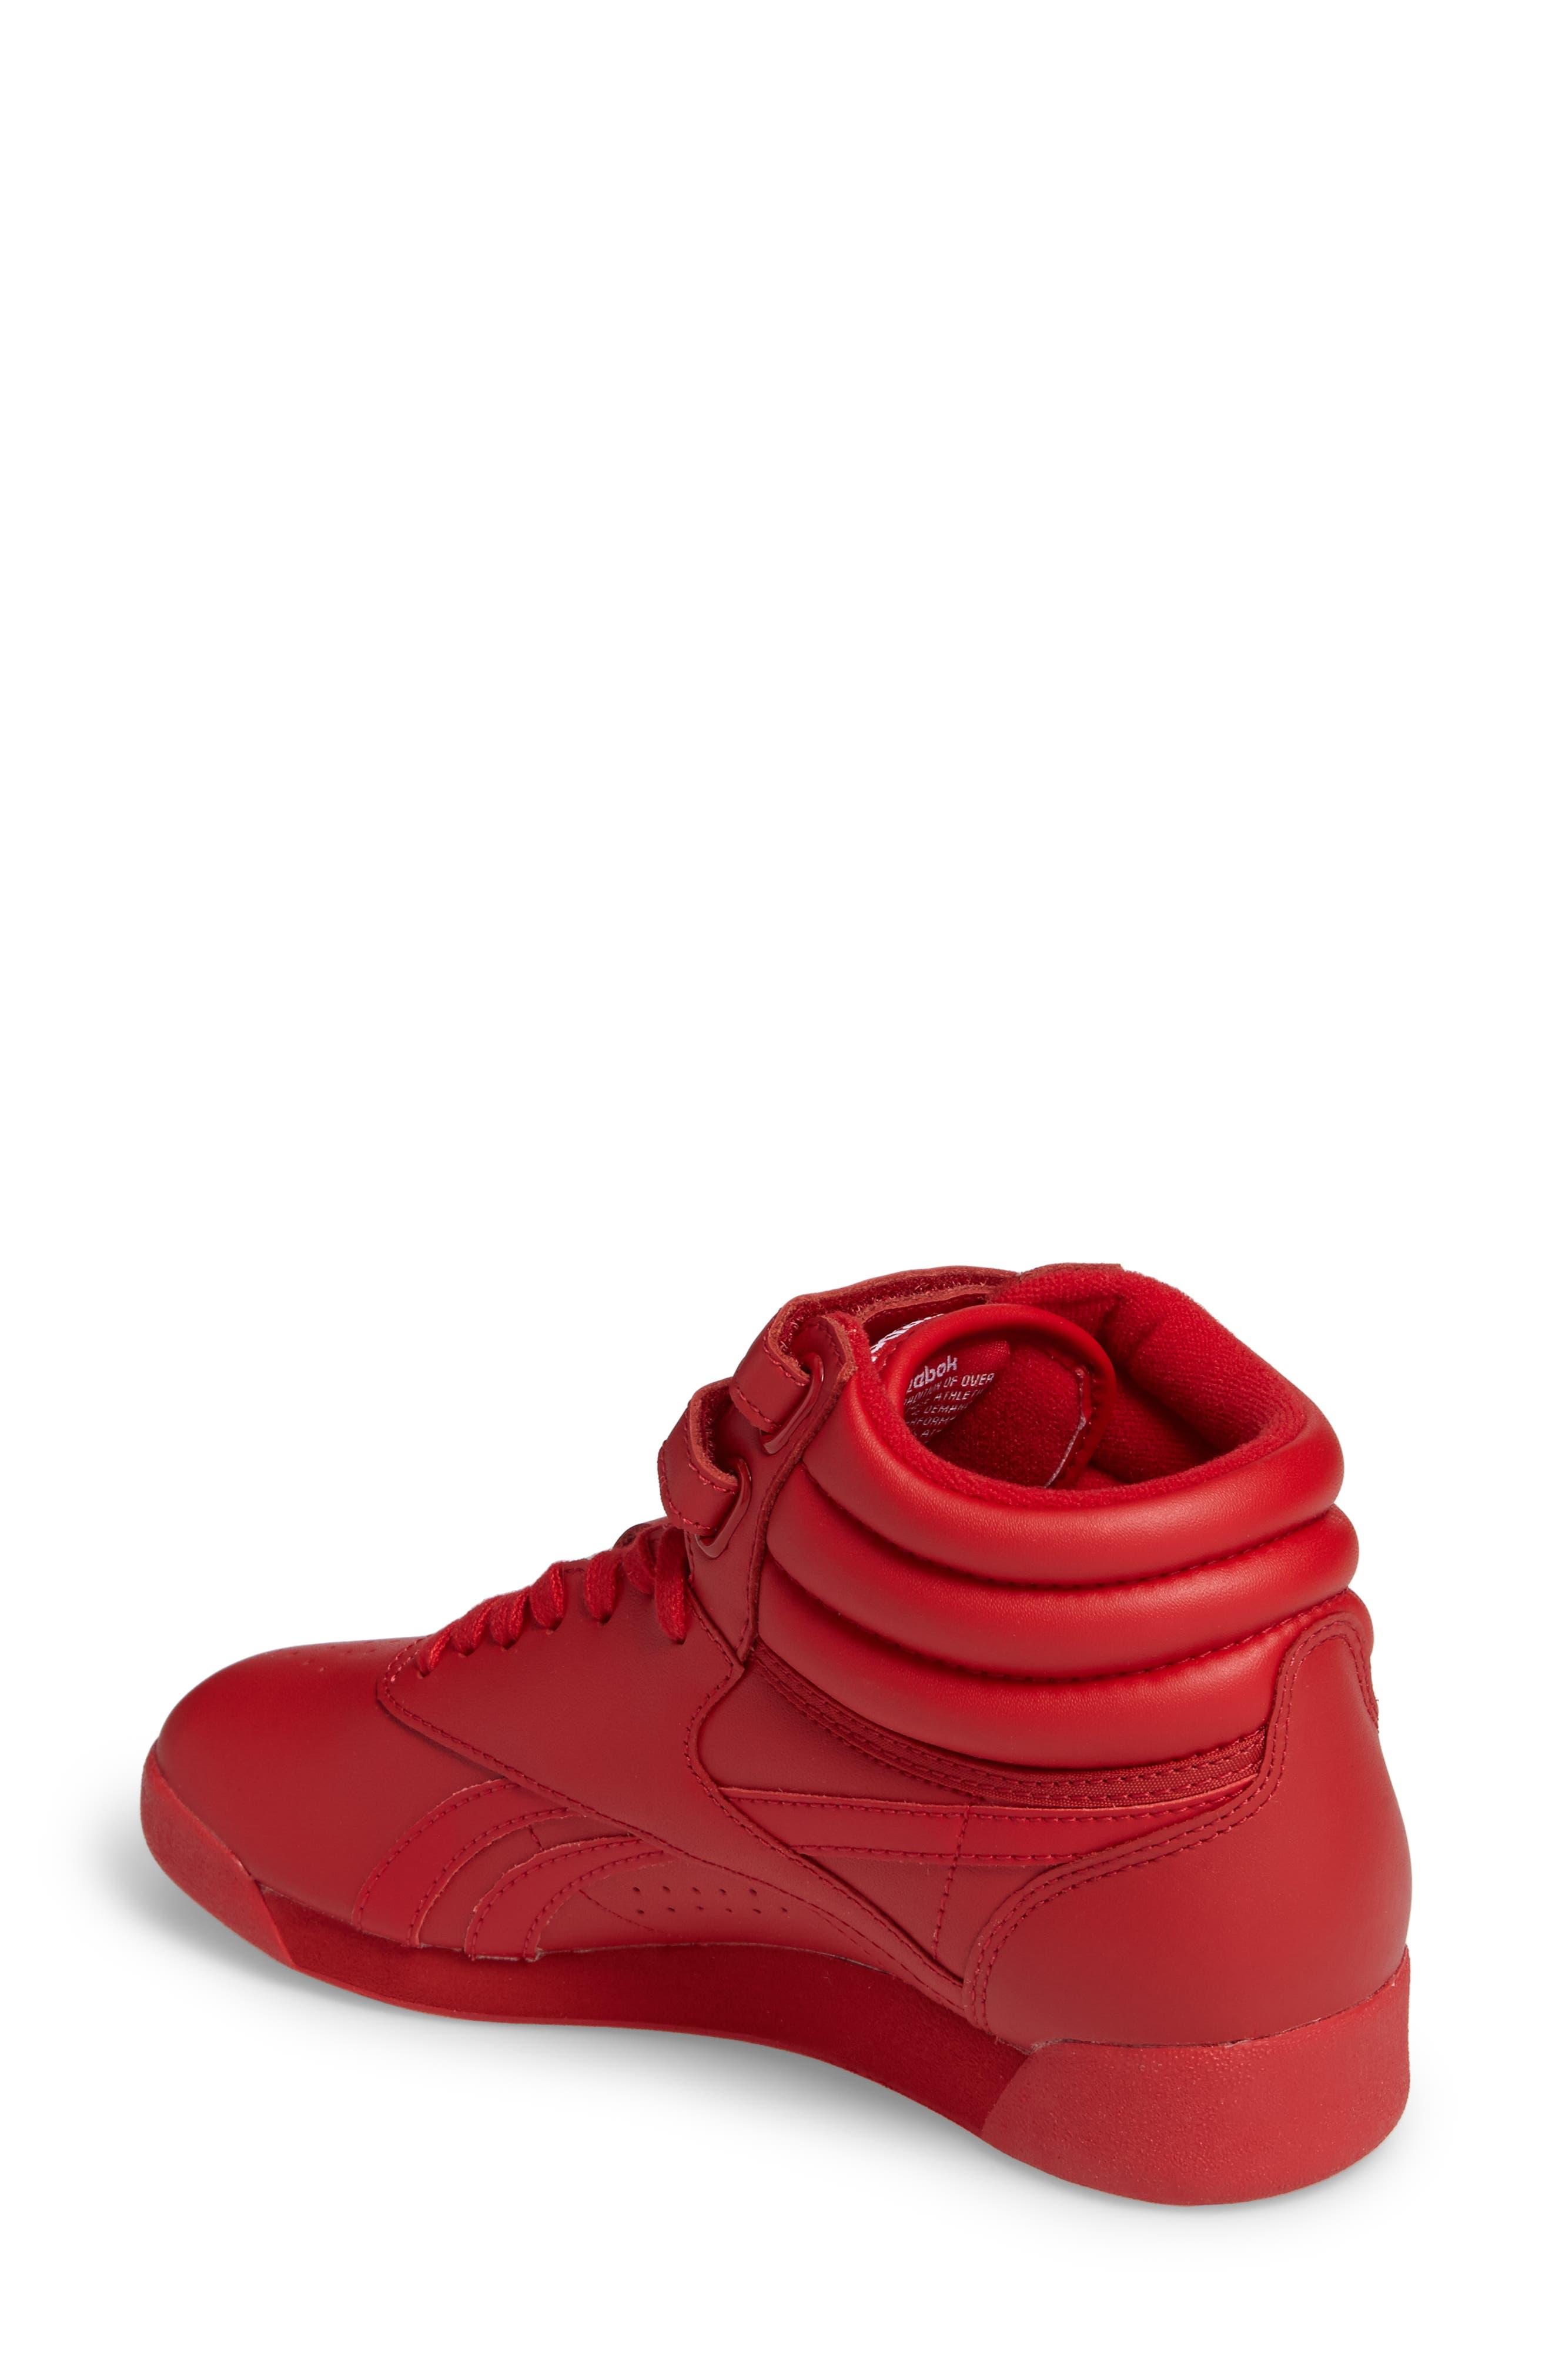 Freestyle Hi Sneaker,                             Alternate thumbnail 4, color,